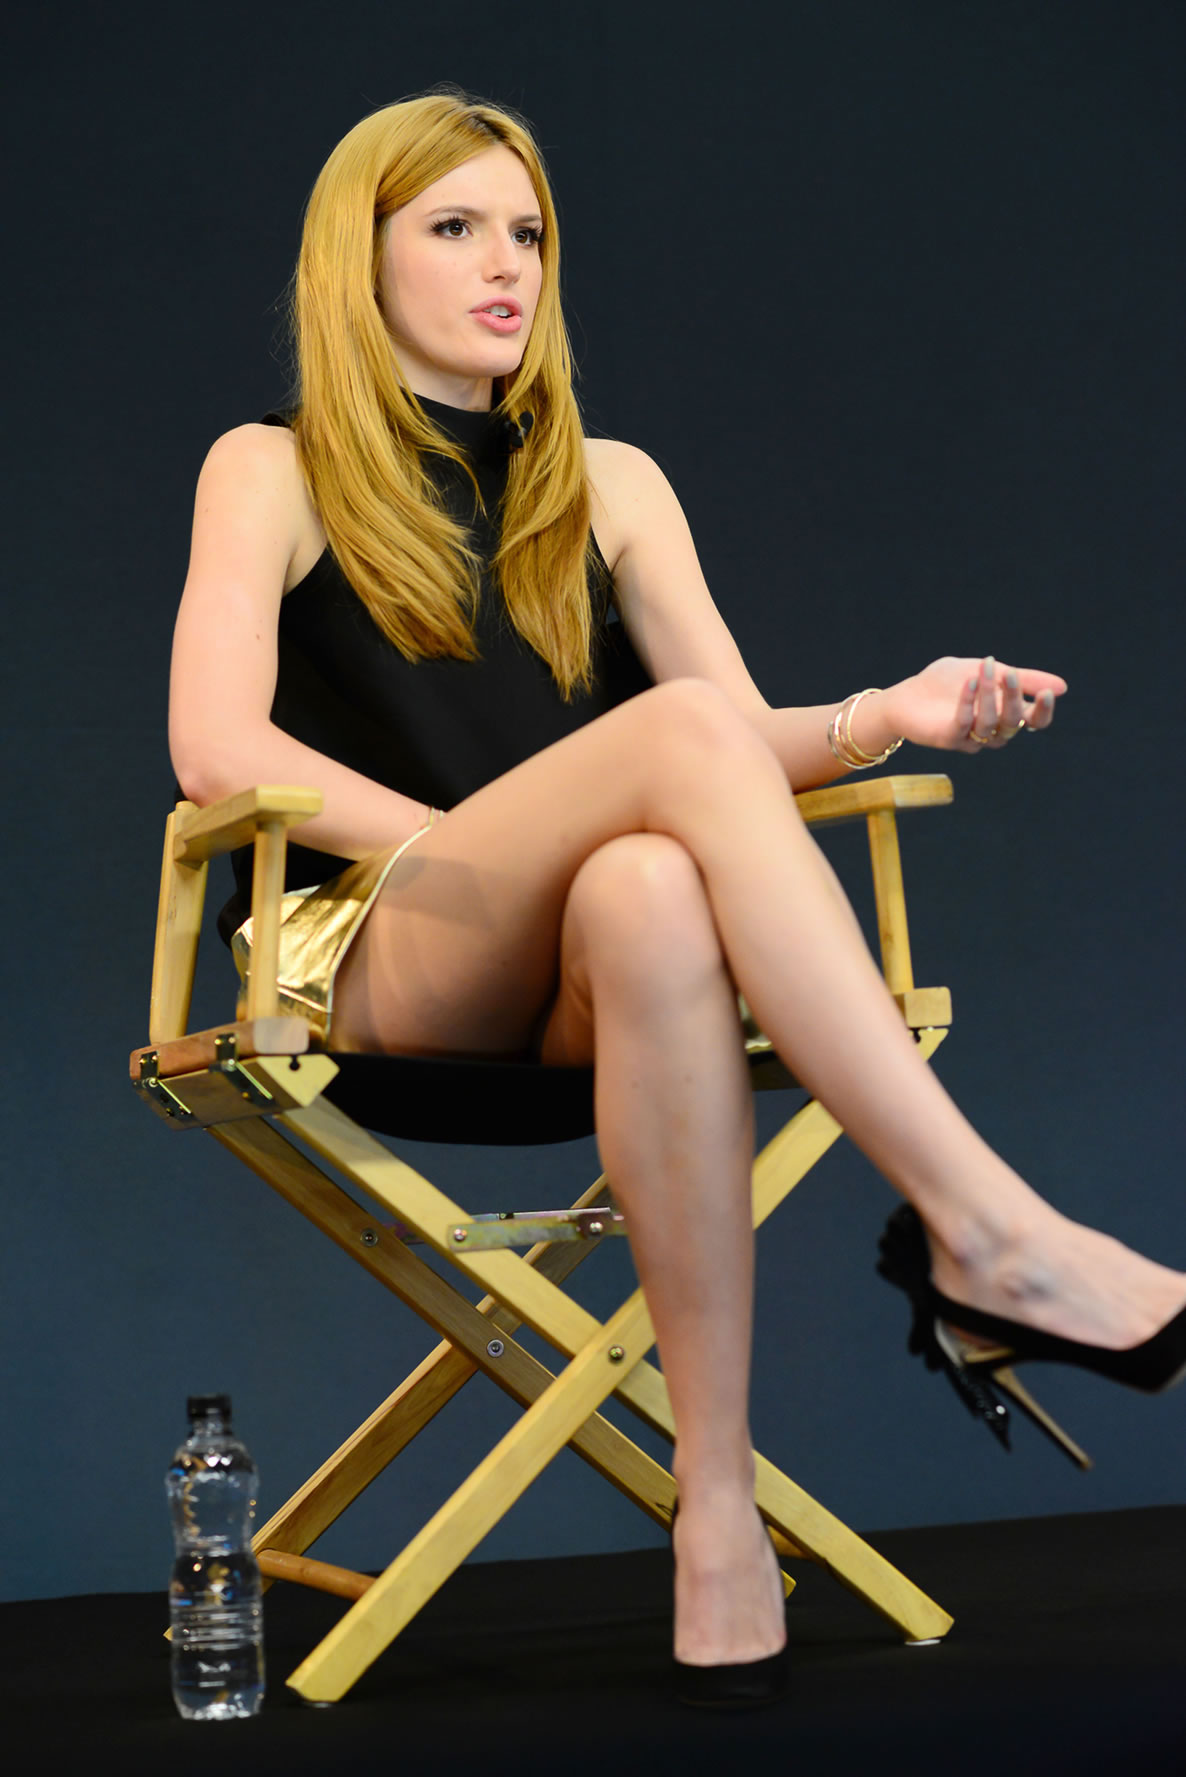 Ashley James shows off her legs in tiny denim mini skirt